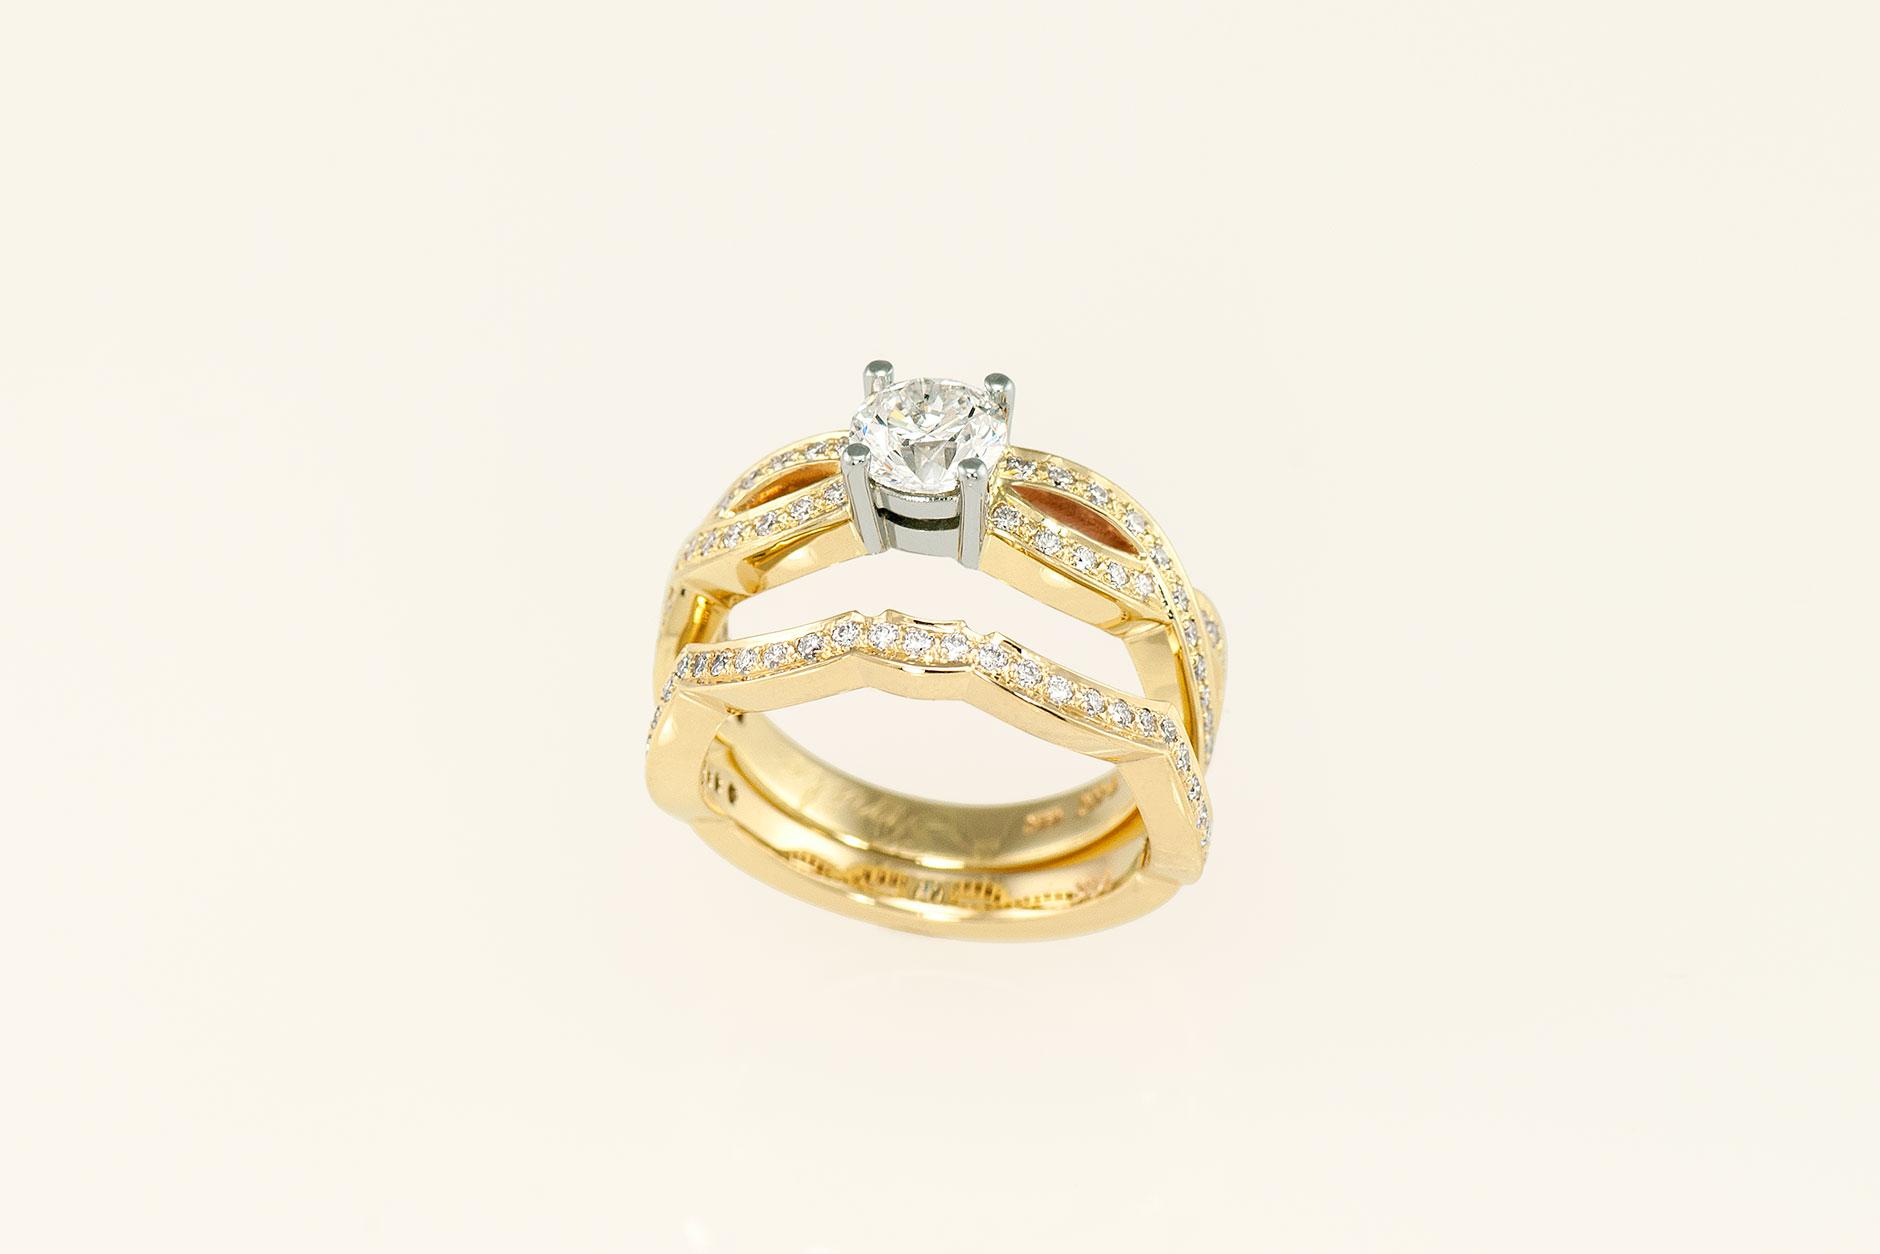 14k Yellow & 19k White Gold Infinity Engagement Ring + Flush Fit Wedding Band - NEWA Goldsmith